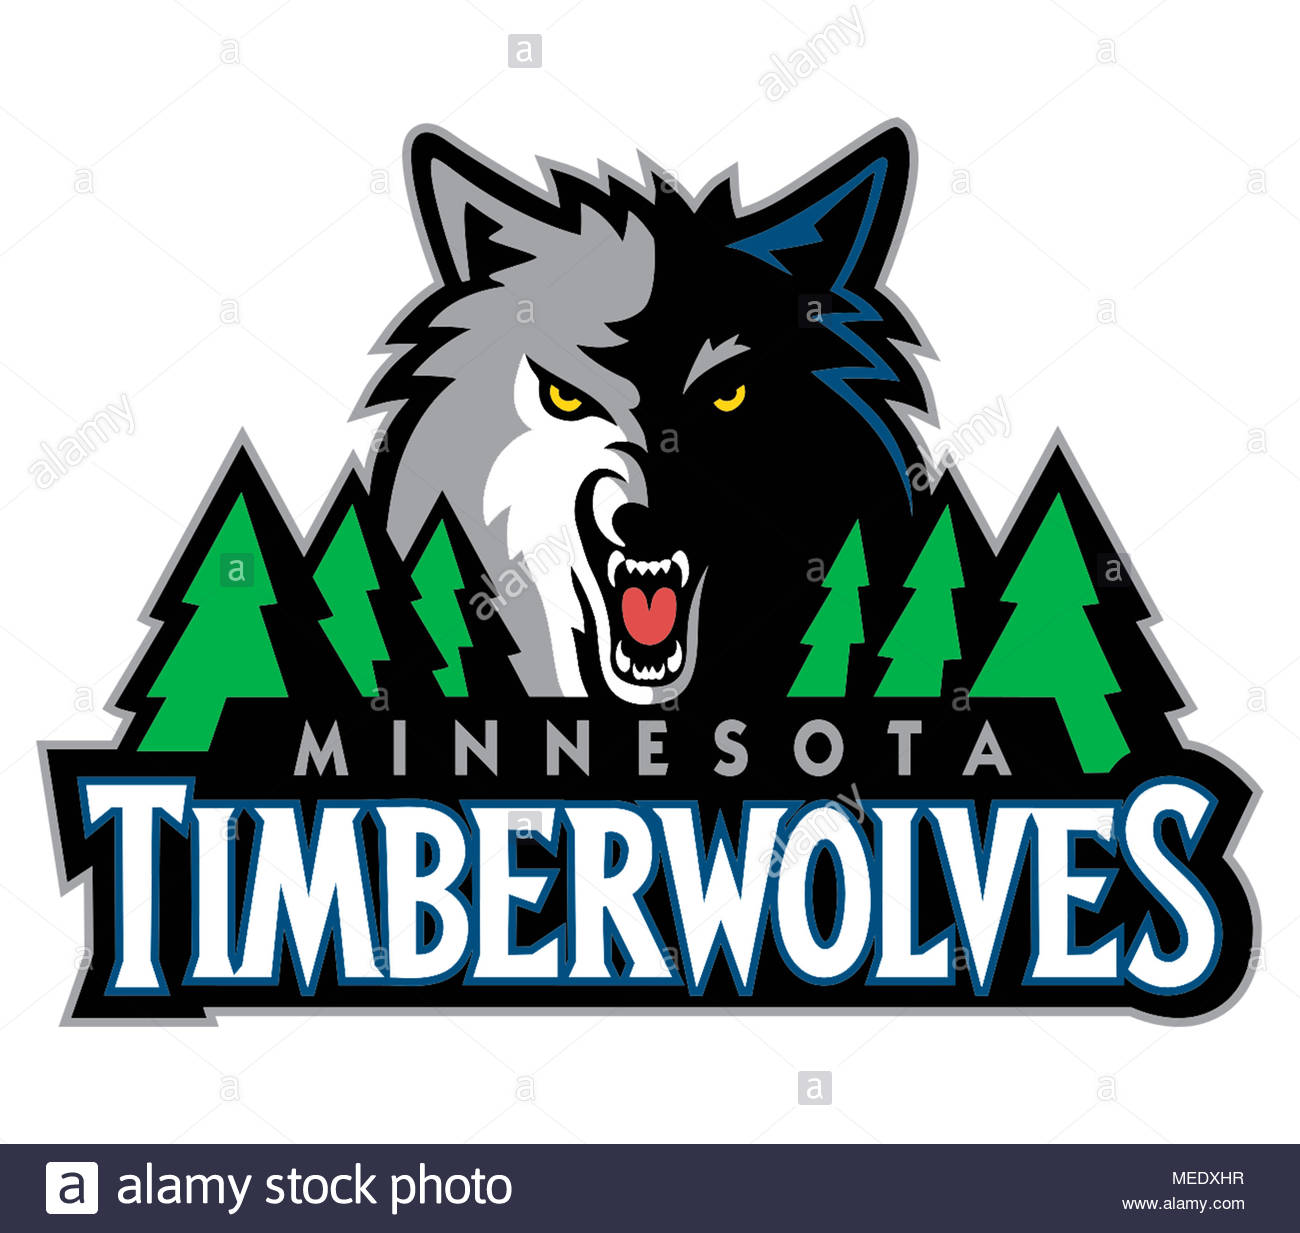 Minnesota Timberwolves icon logo-Minnesota Timberwolves icon logo-10